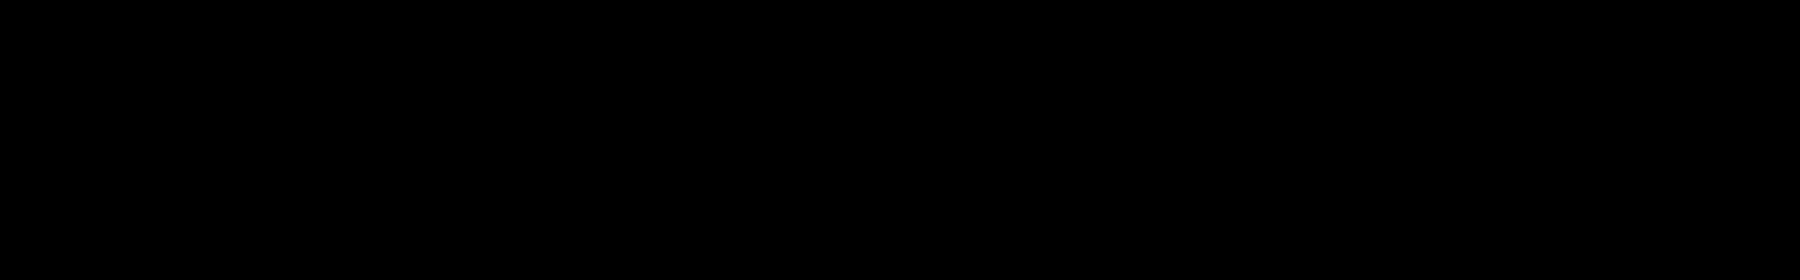 Techno Sequences audio waveform